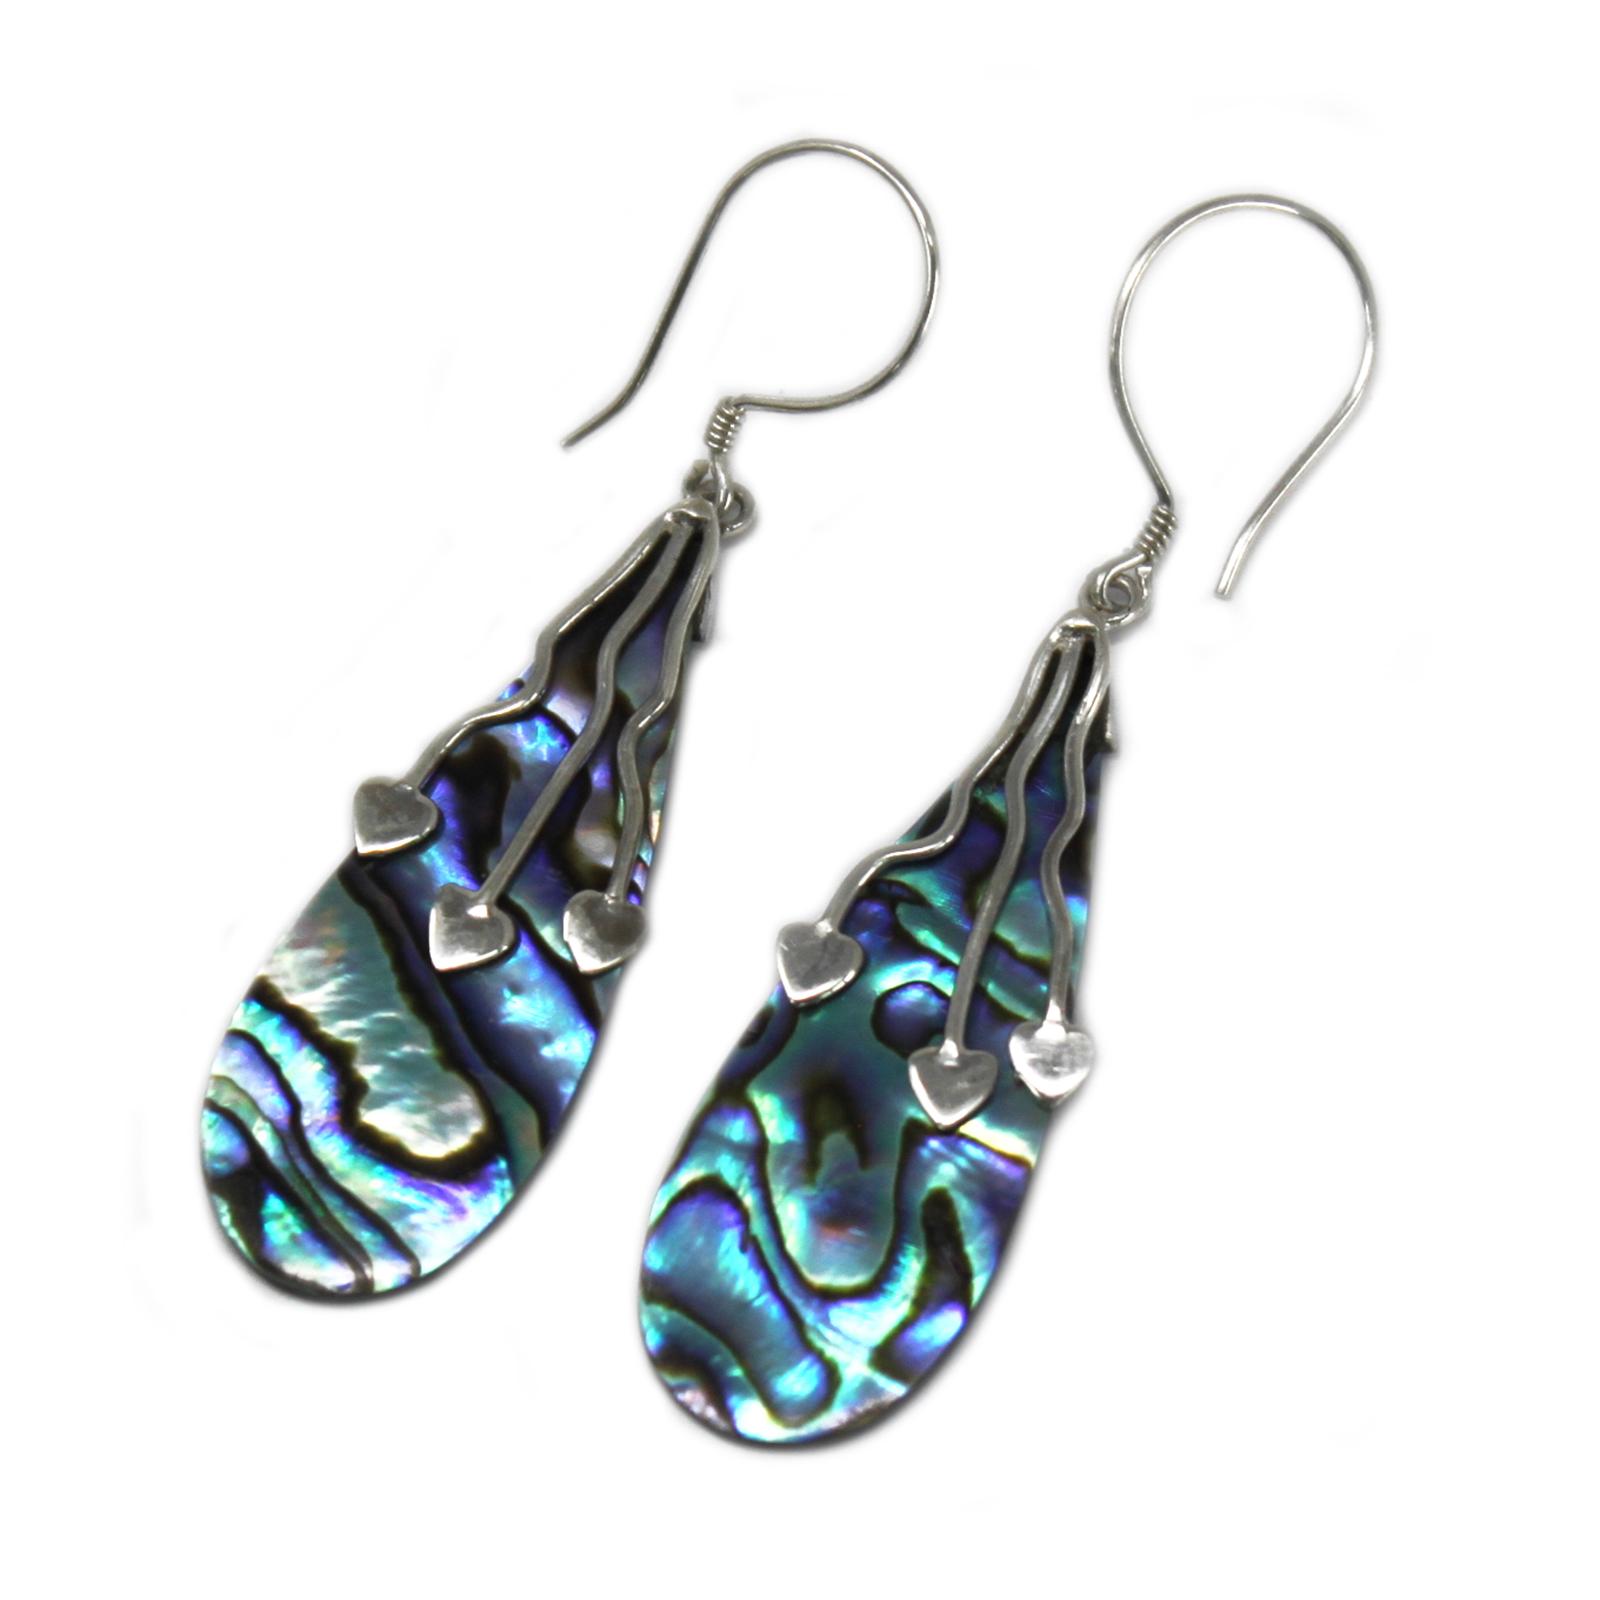 Shell & Silver Earrings - Three Hearts - Abalone